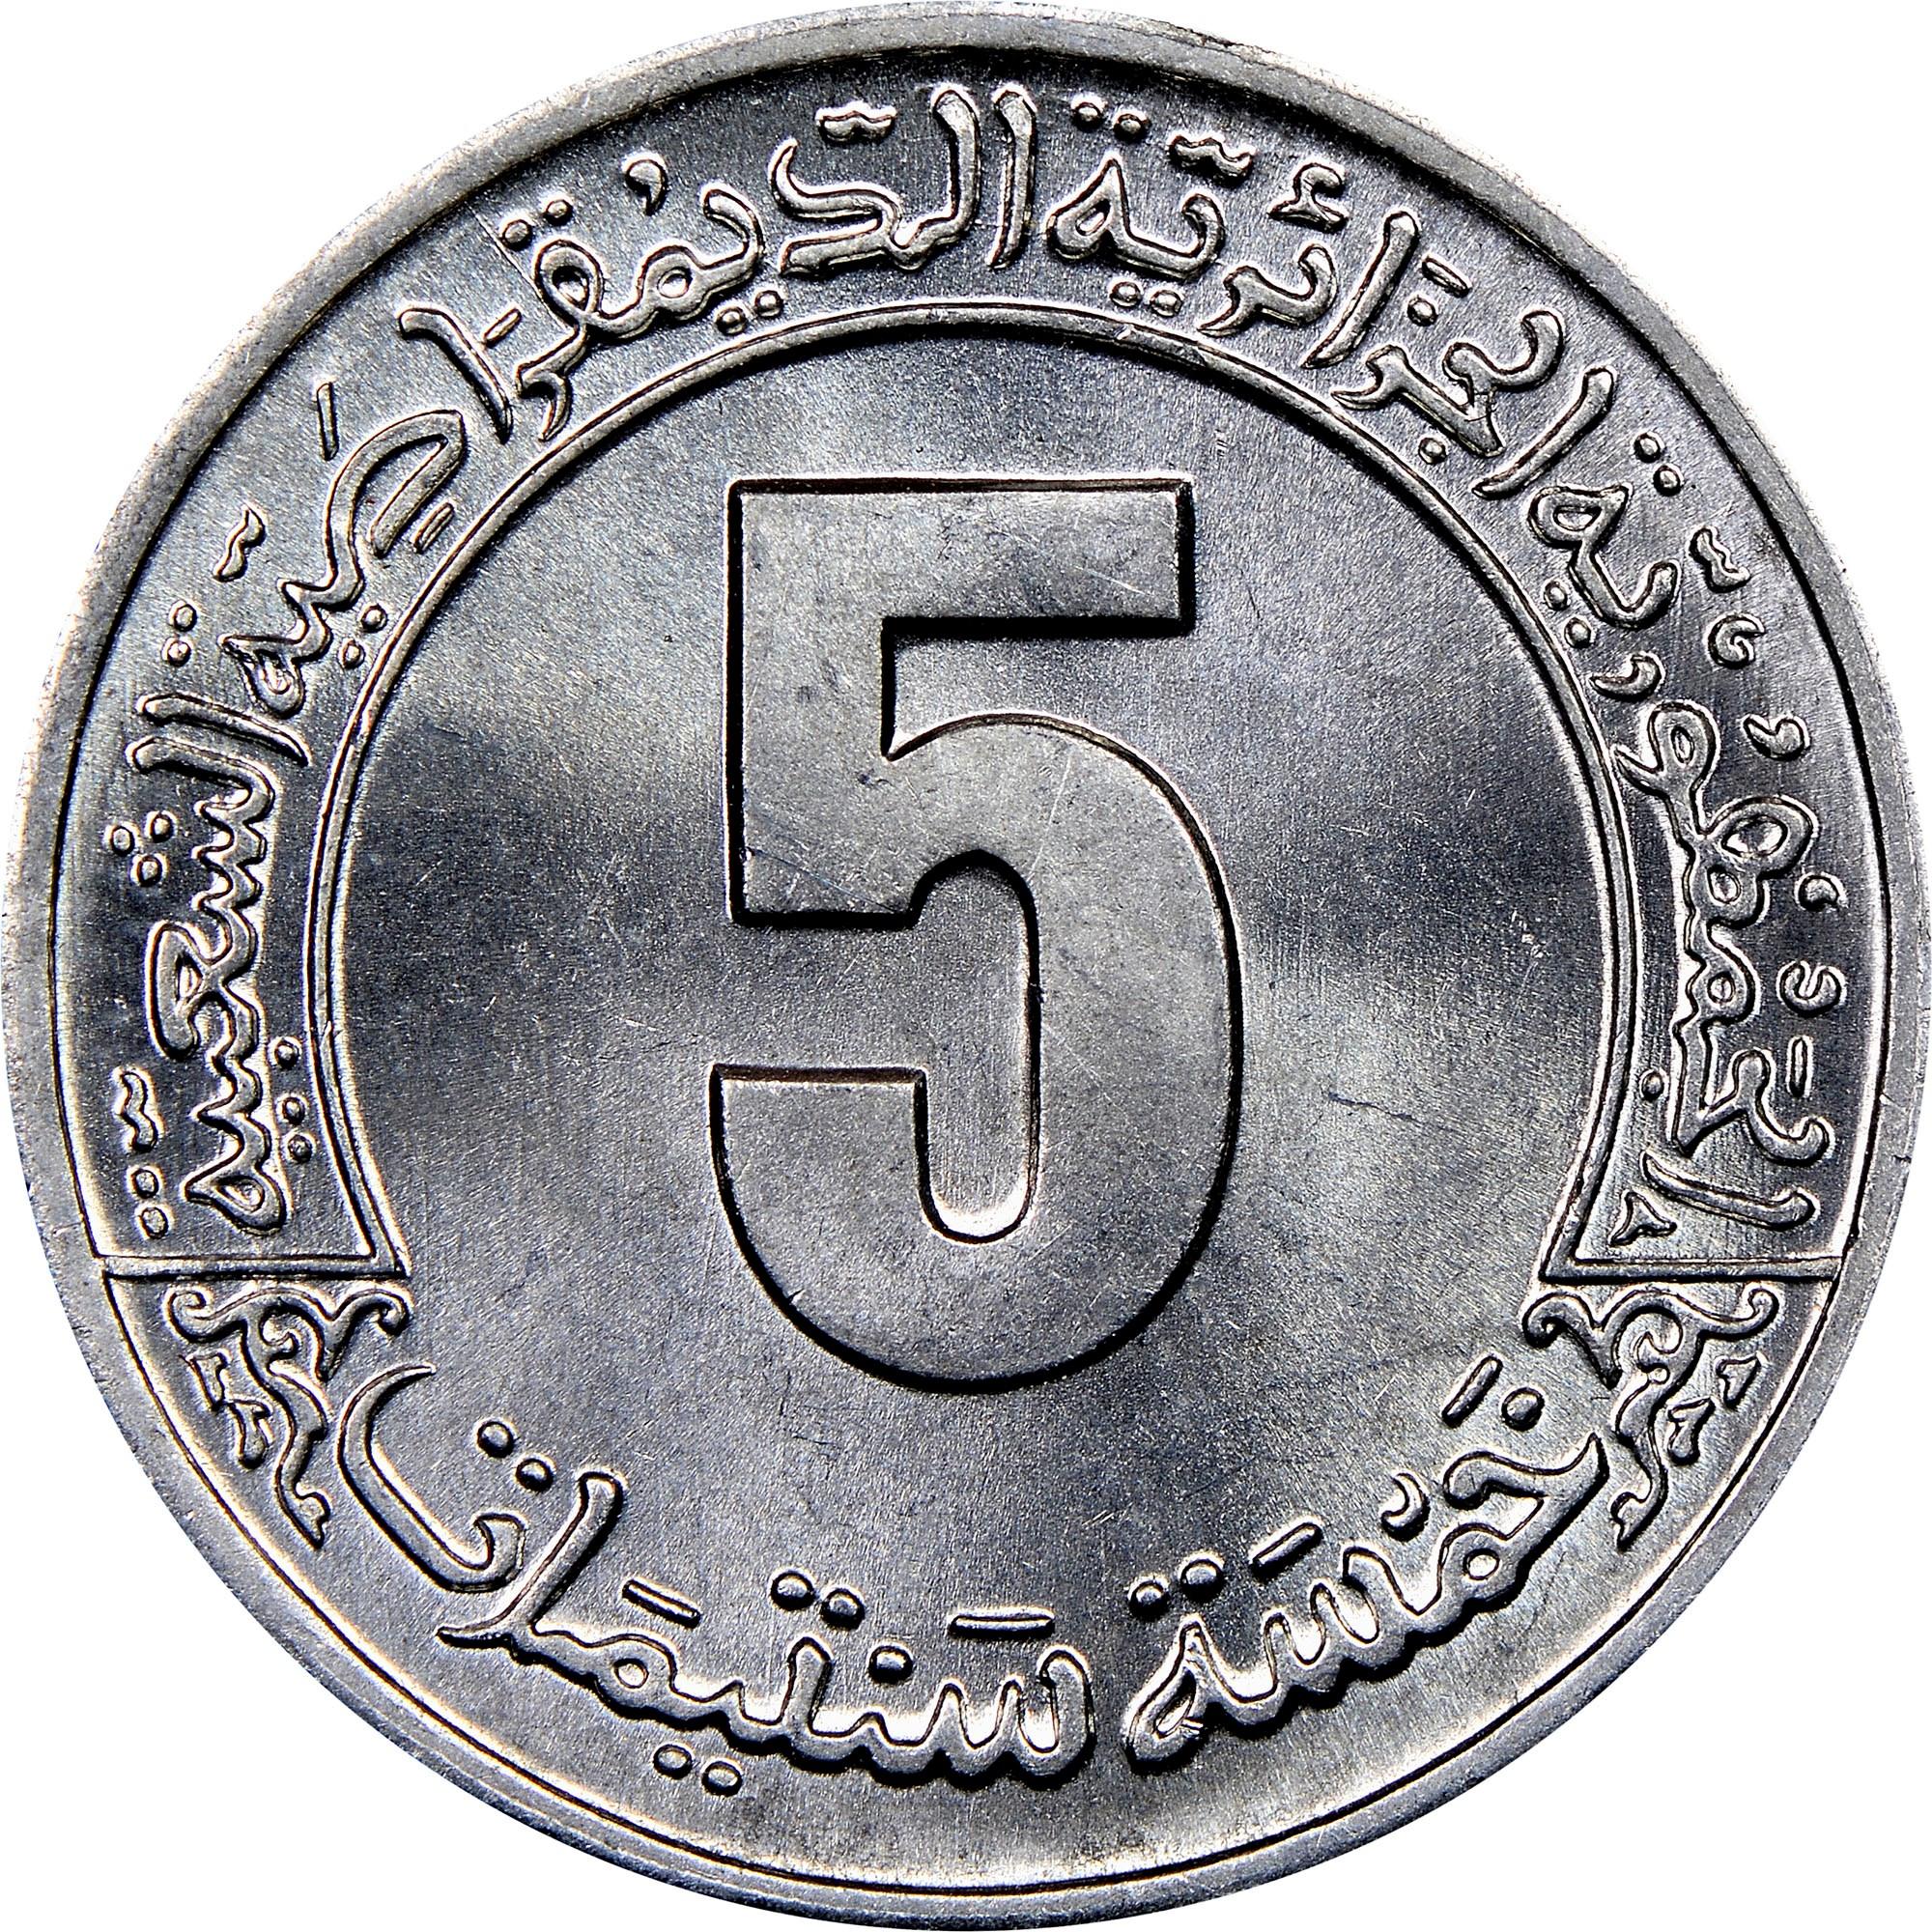 Algeria 5 Centimes obverse